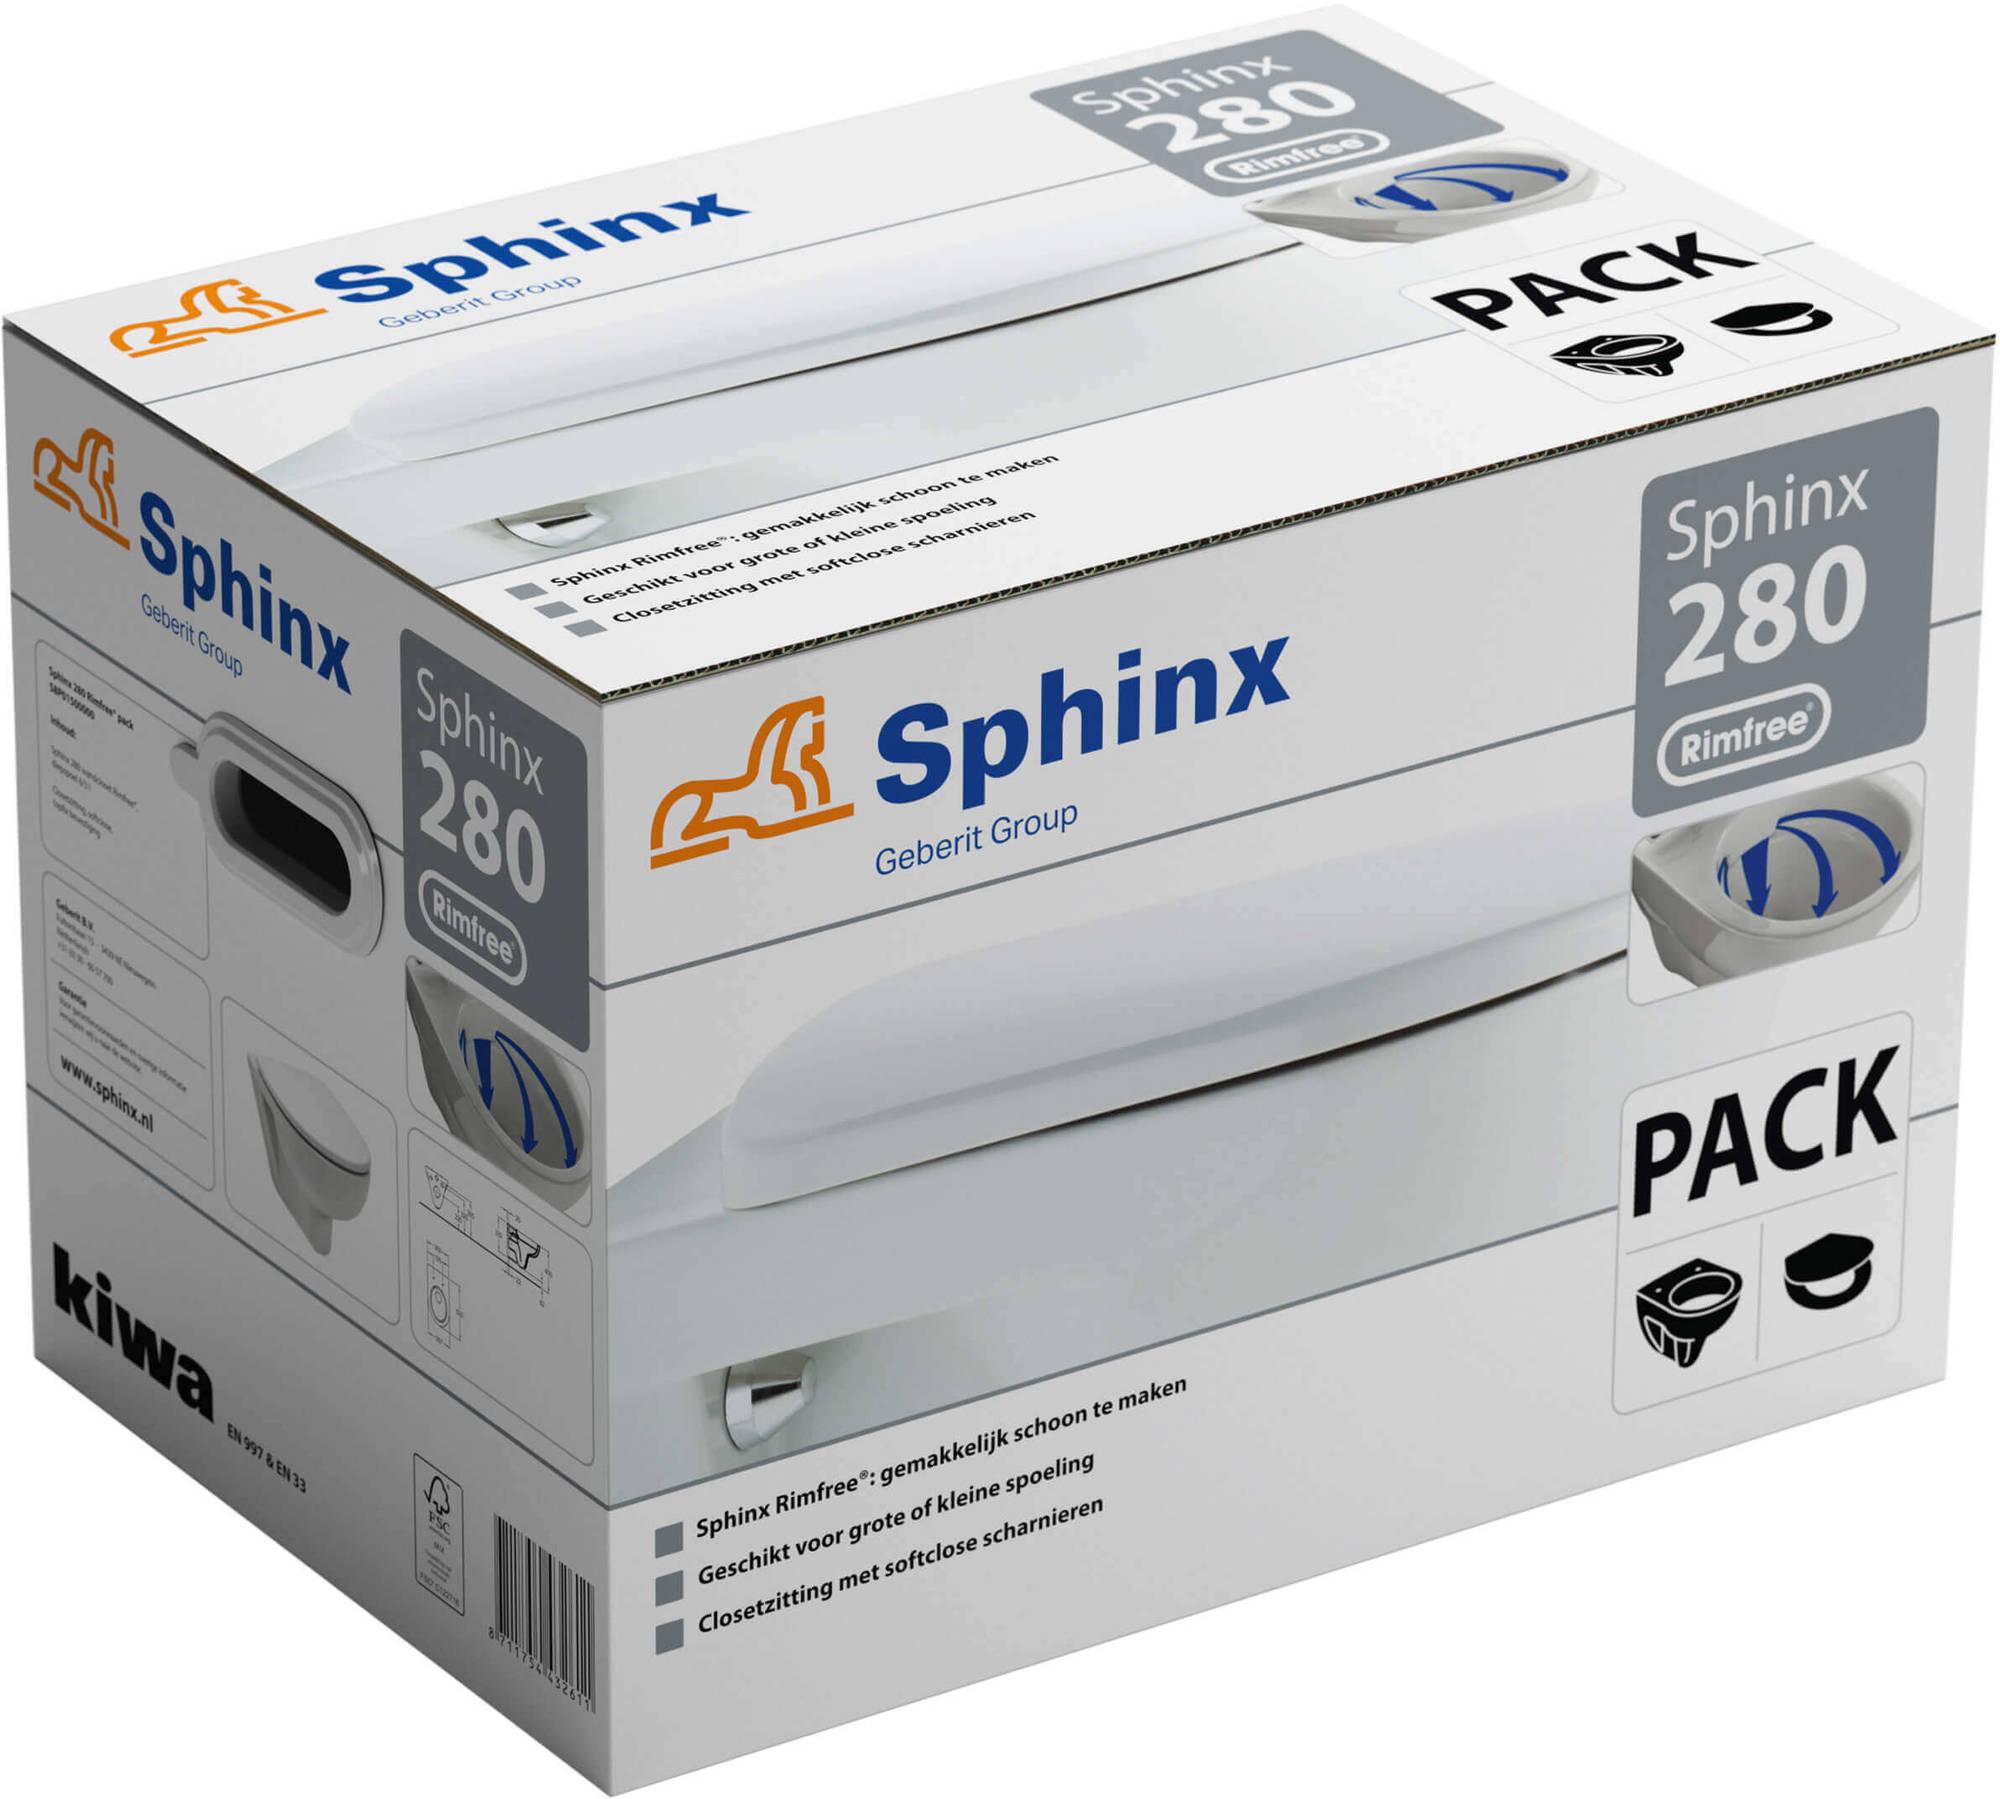 Sphinx 280 wc pack wandcloset diepspoel Rimfree met closetzitting softclose, wit